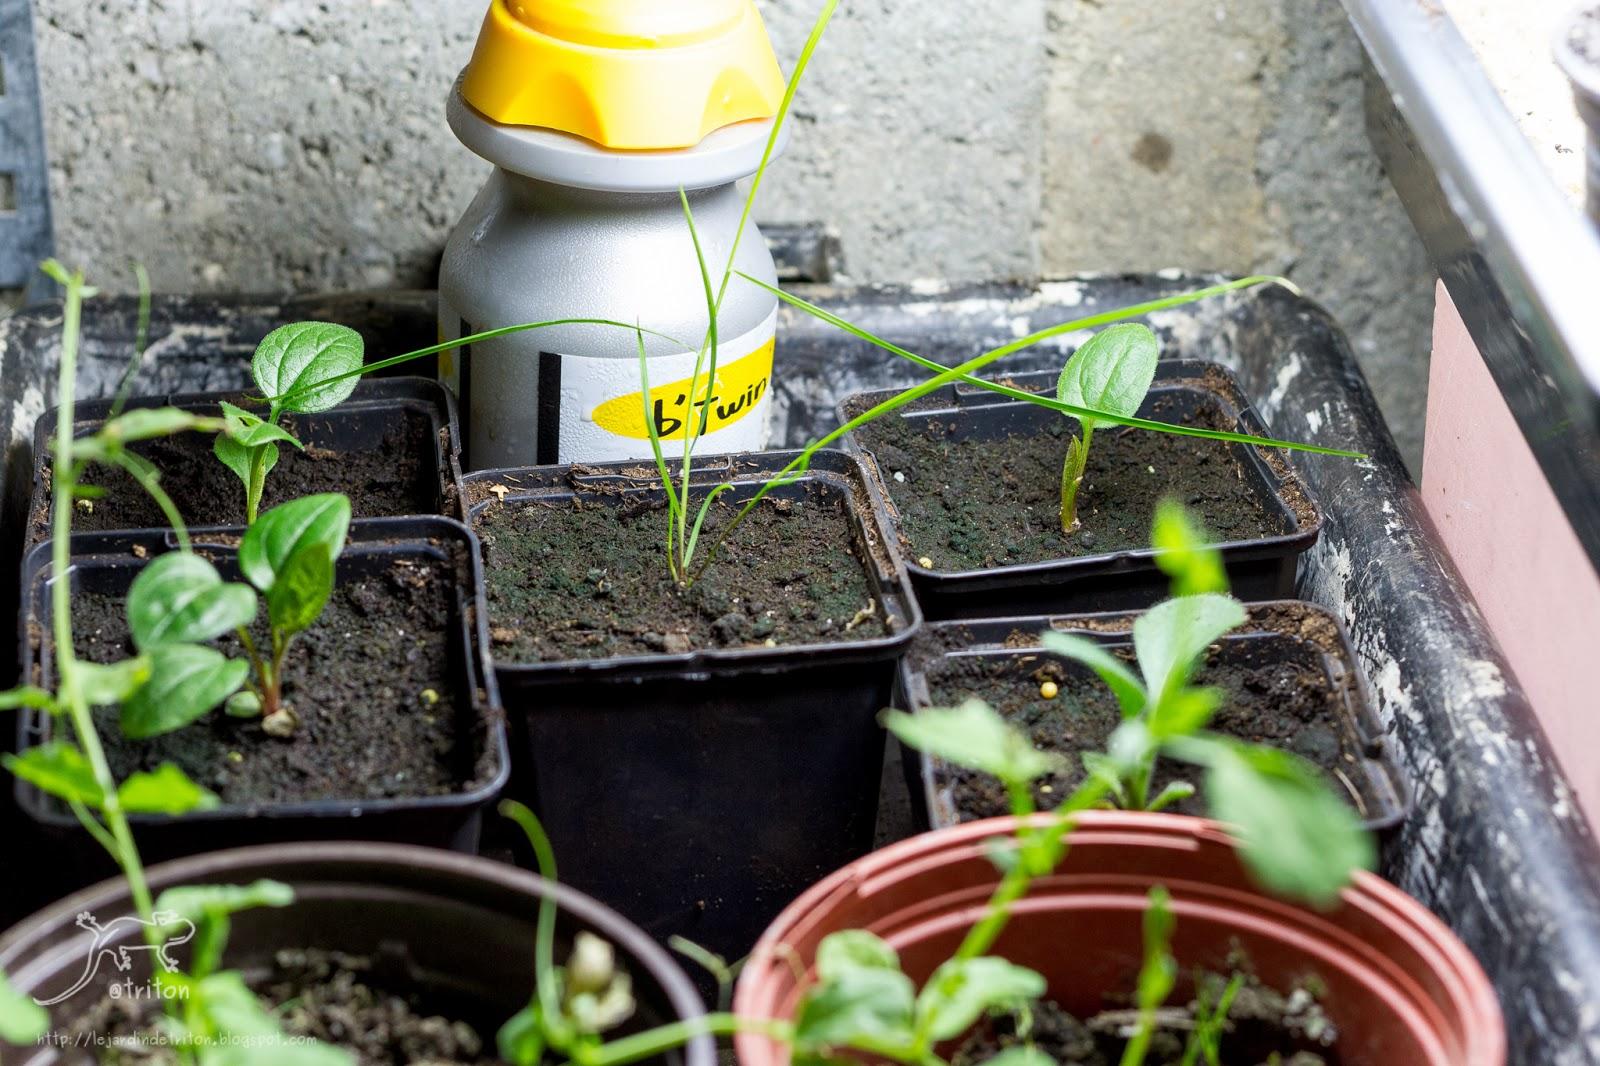 Le jardin de triton mes premiers semis - Arrosage gazon apres semis ...